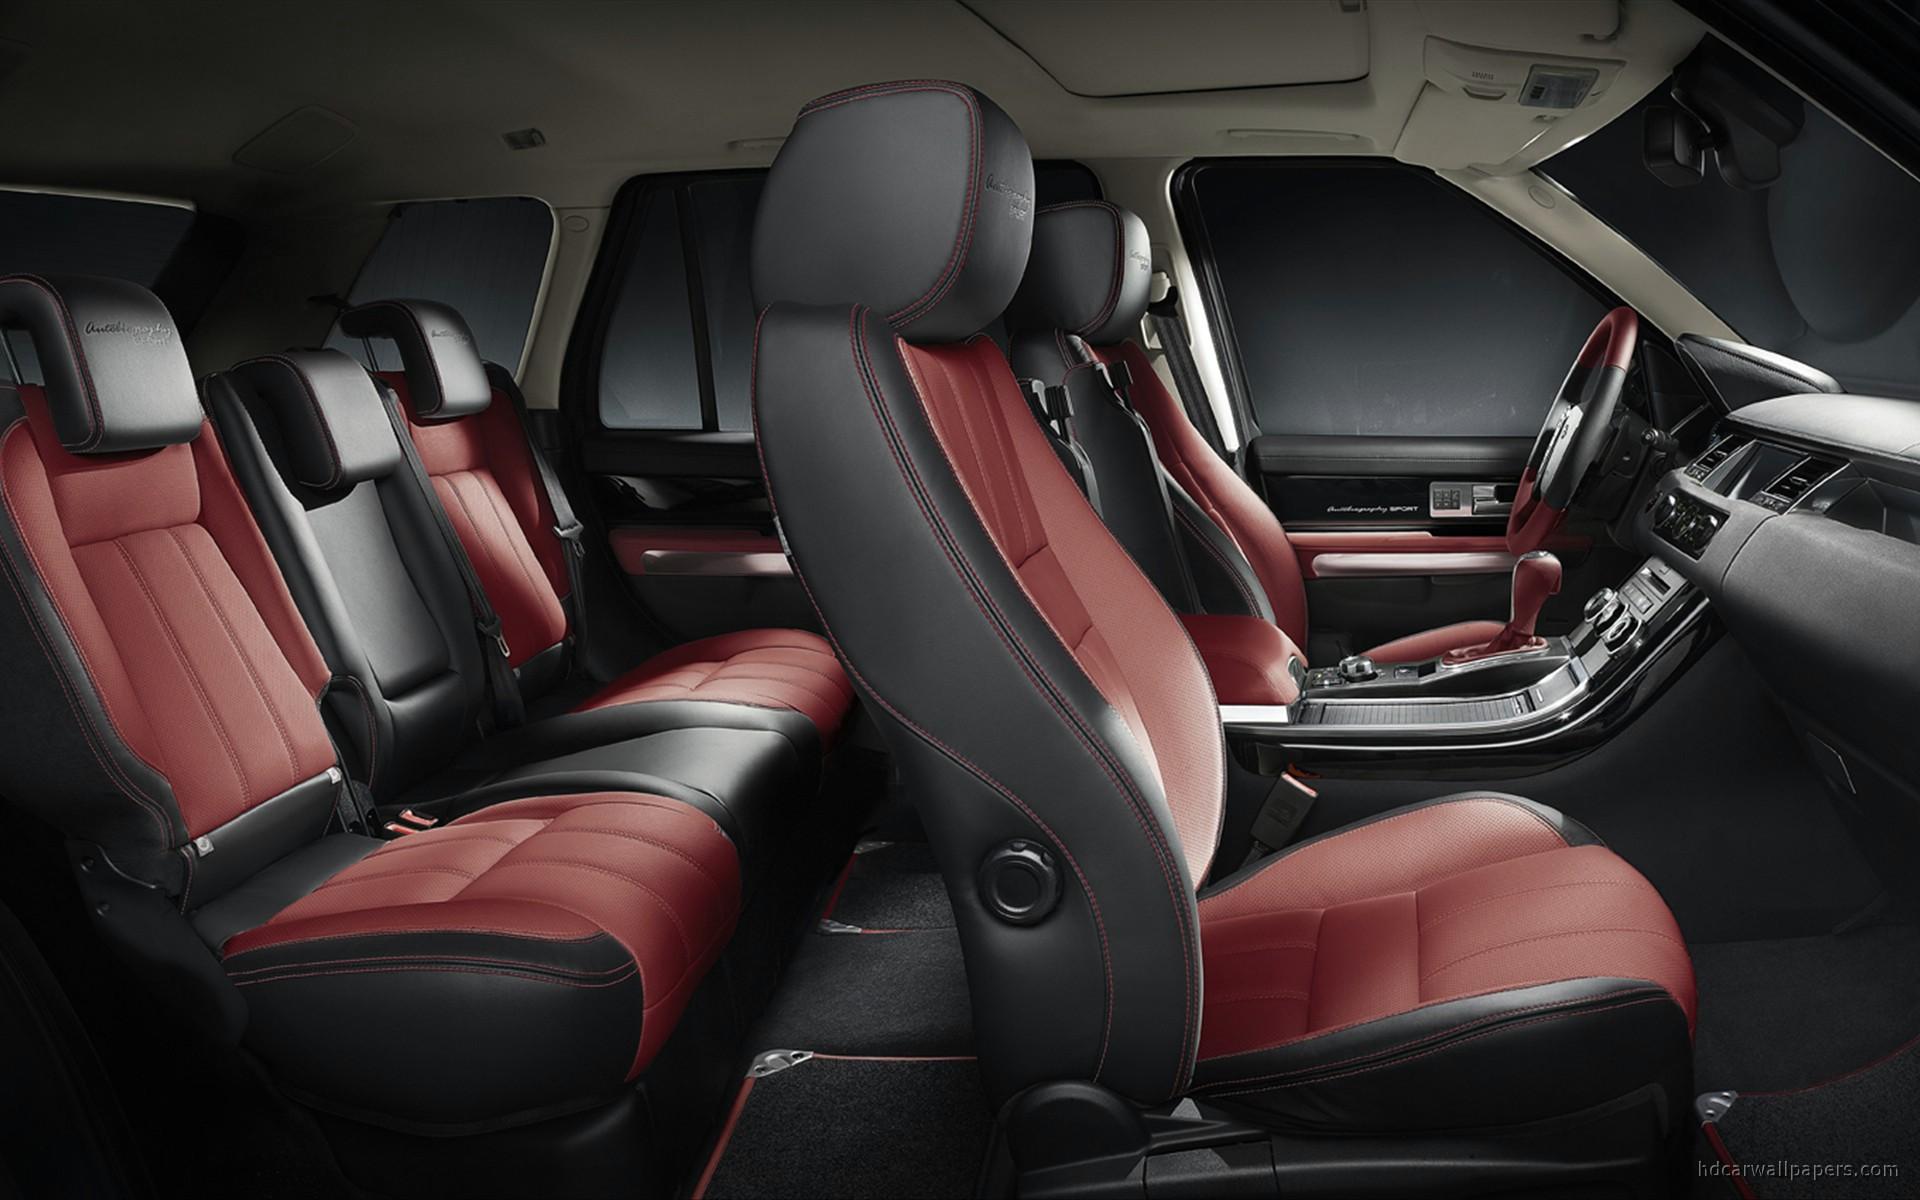 2010 range rover sport interior wallpaper hd car wallpapers for The range wallpaper sale